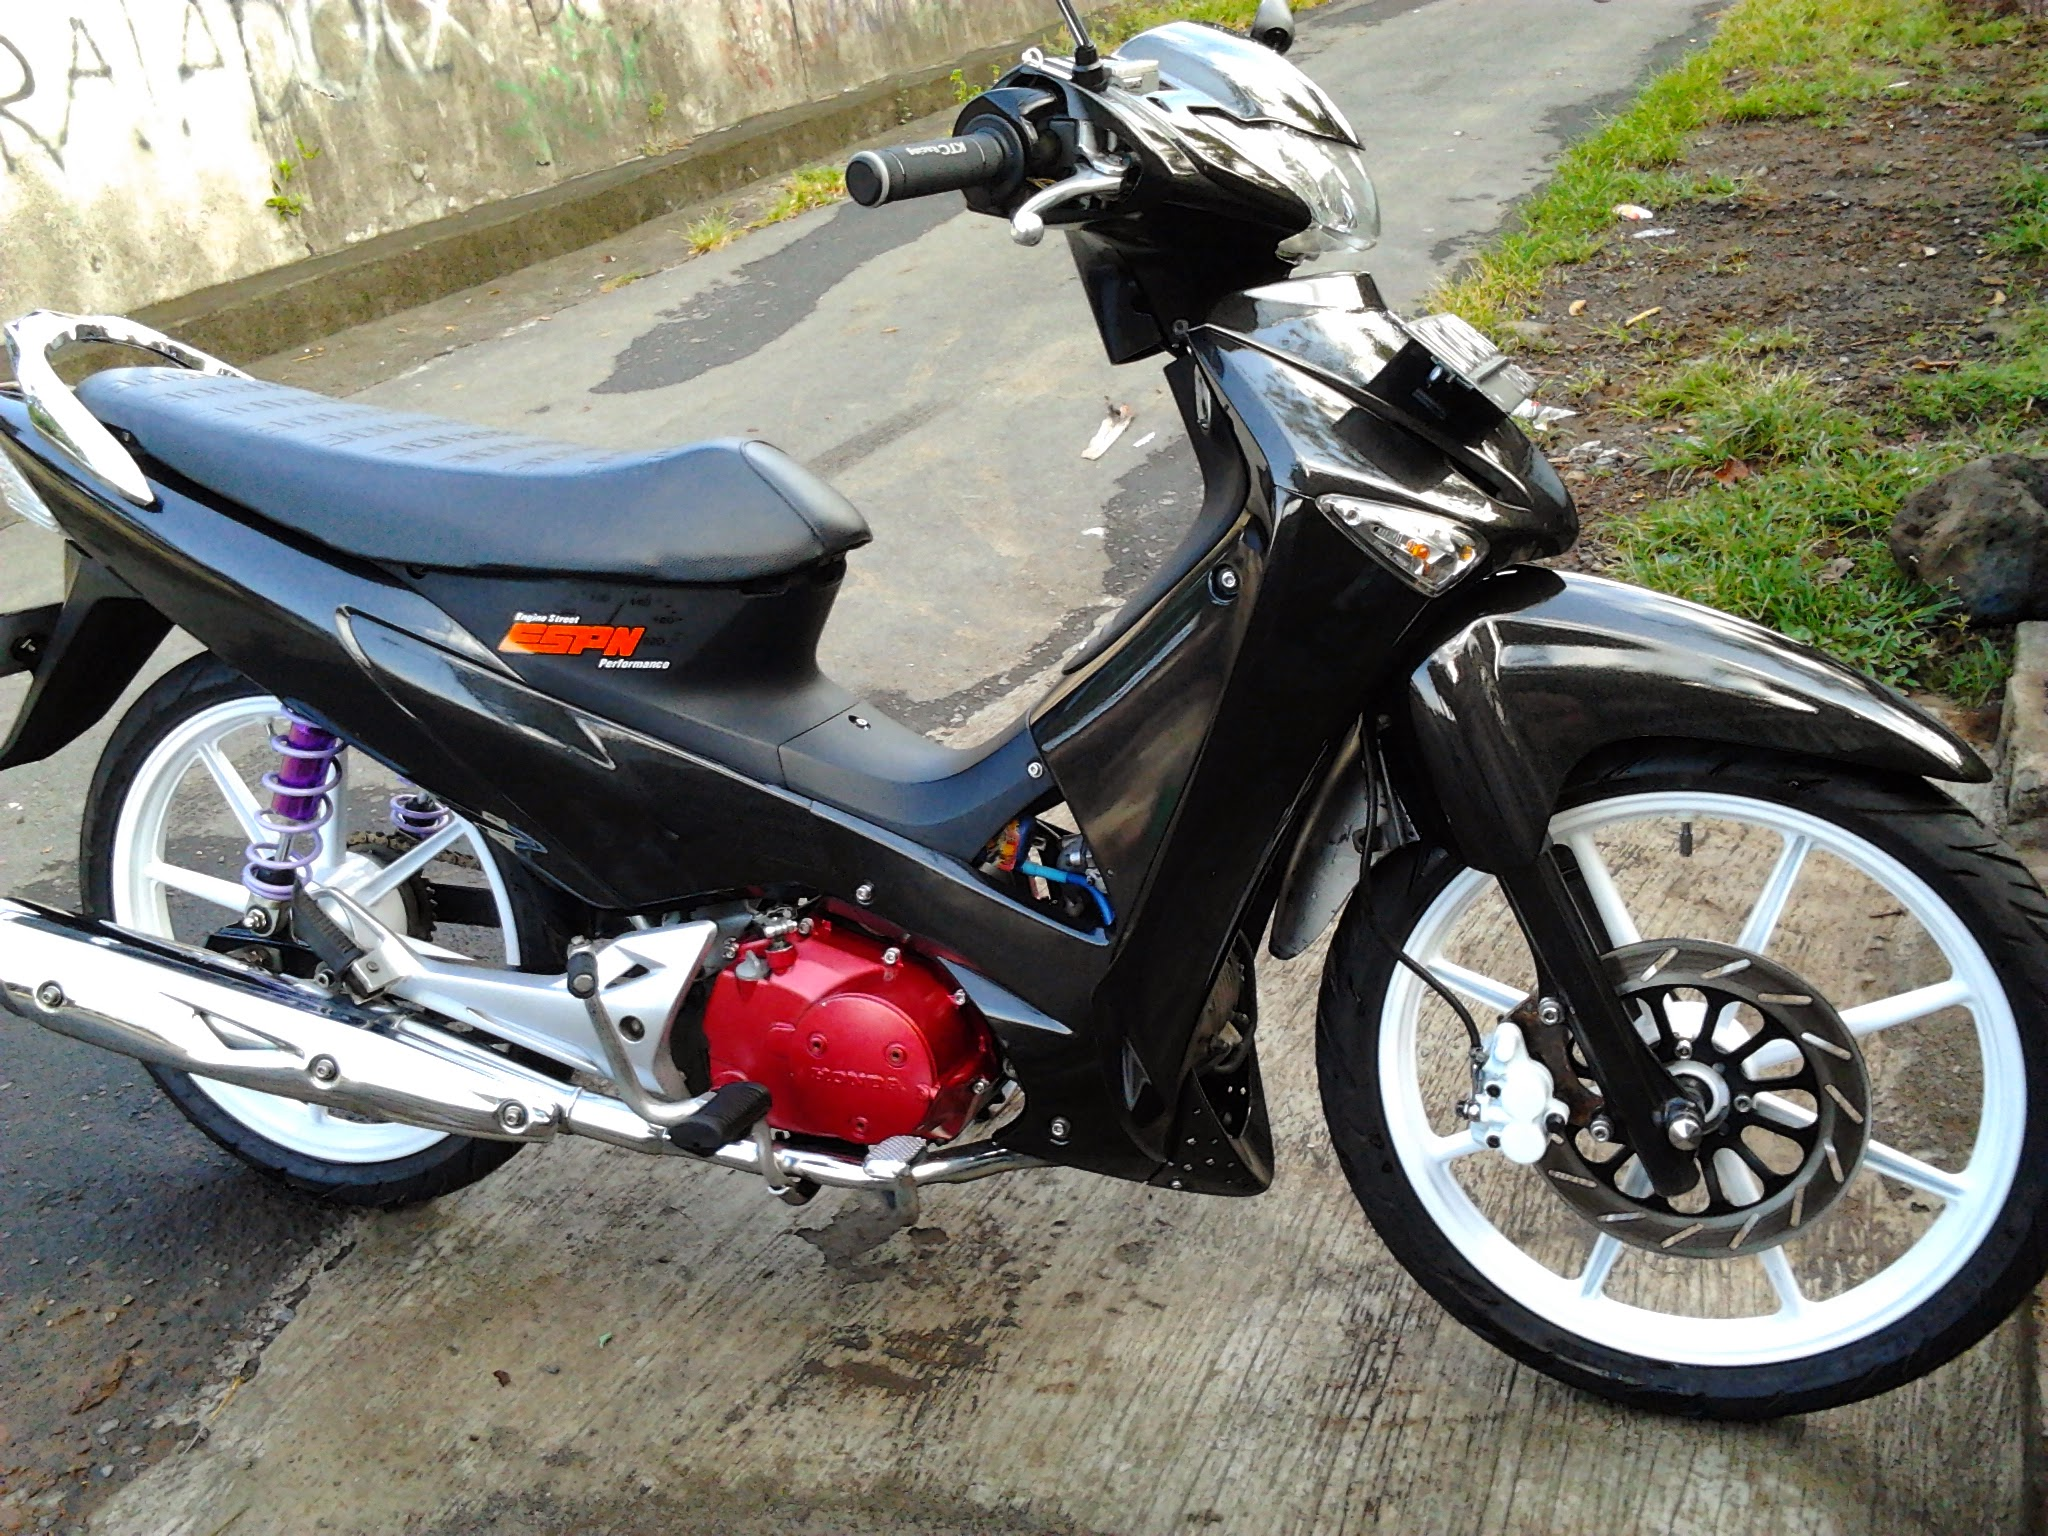 Modifikasi Minimalis Honda Supra X 125 R